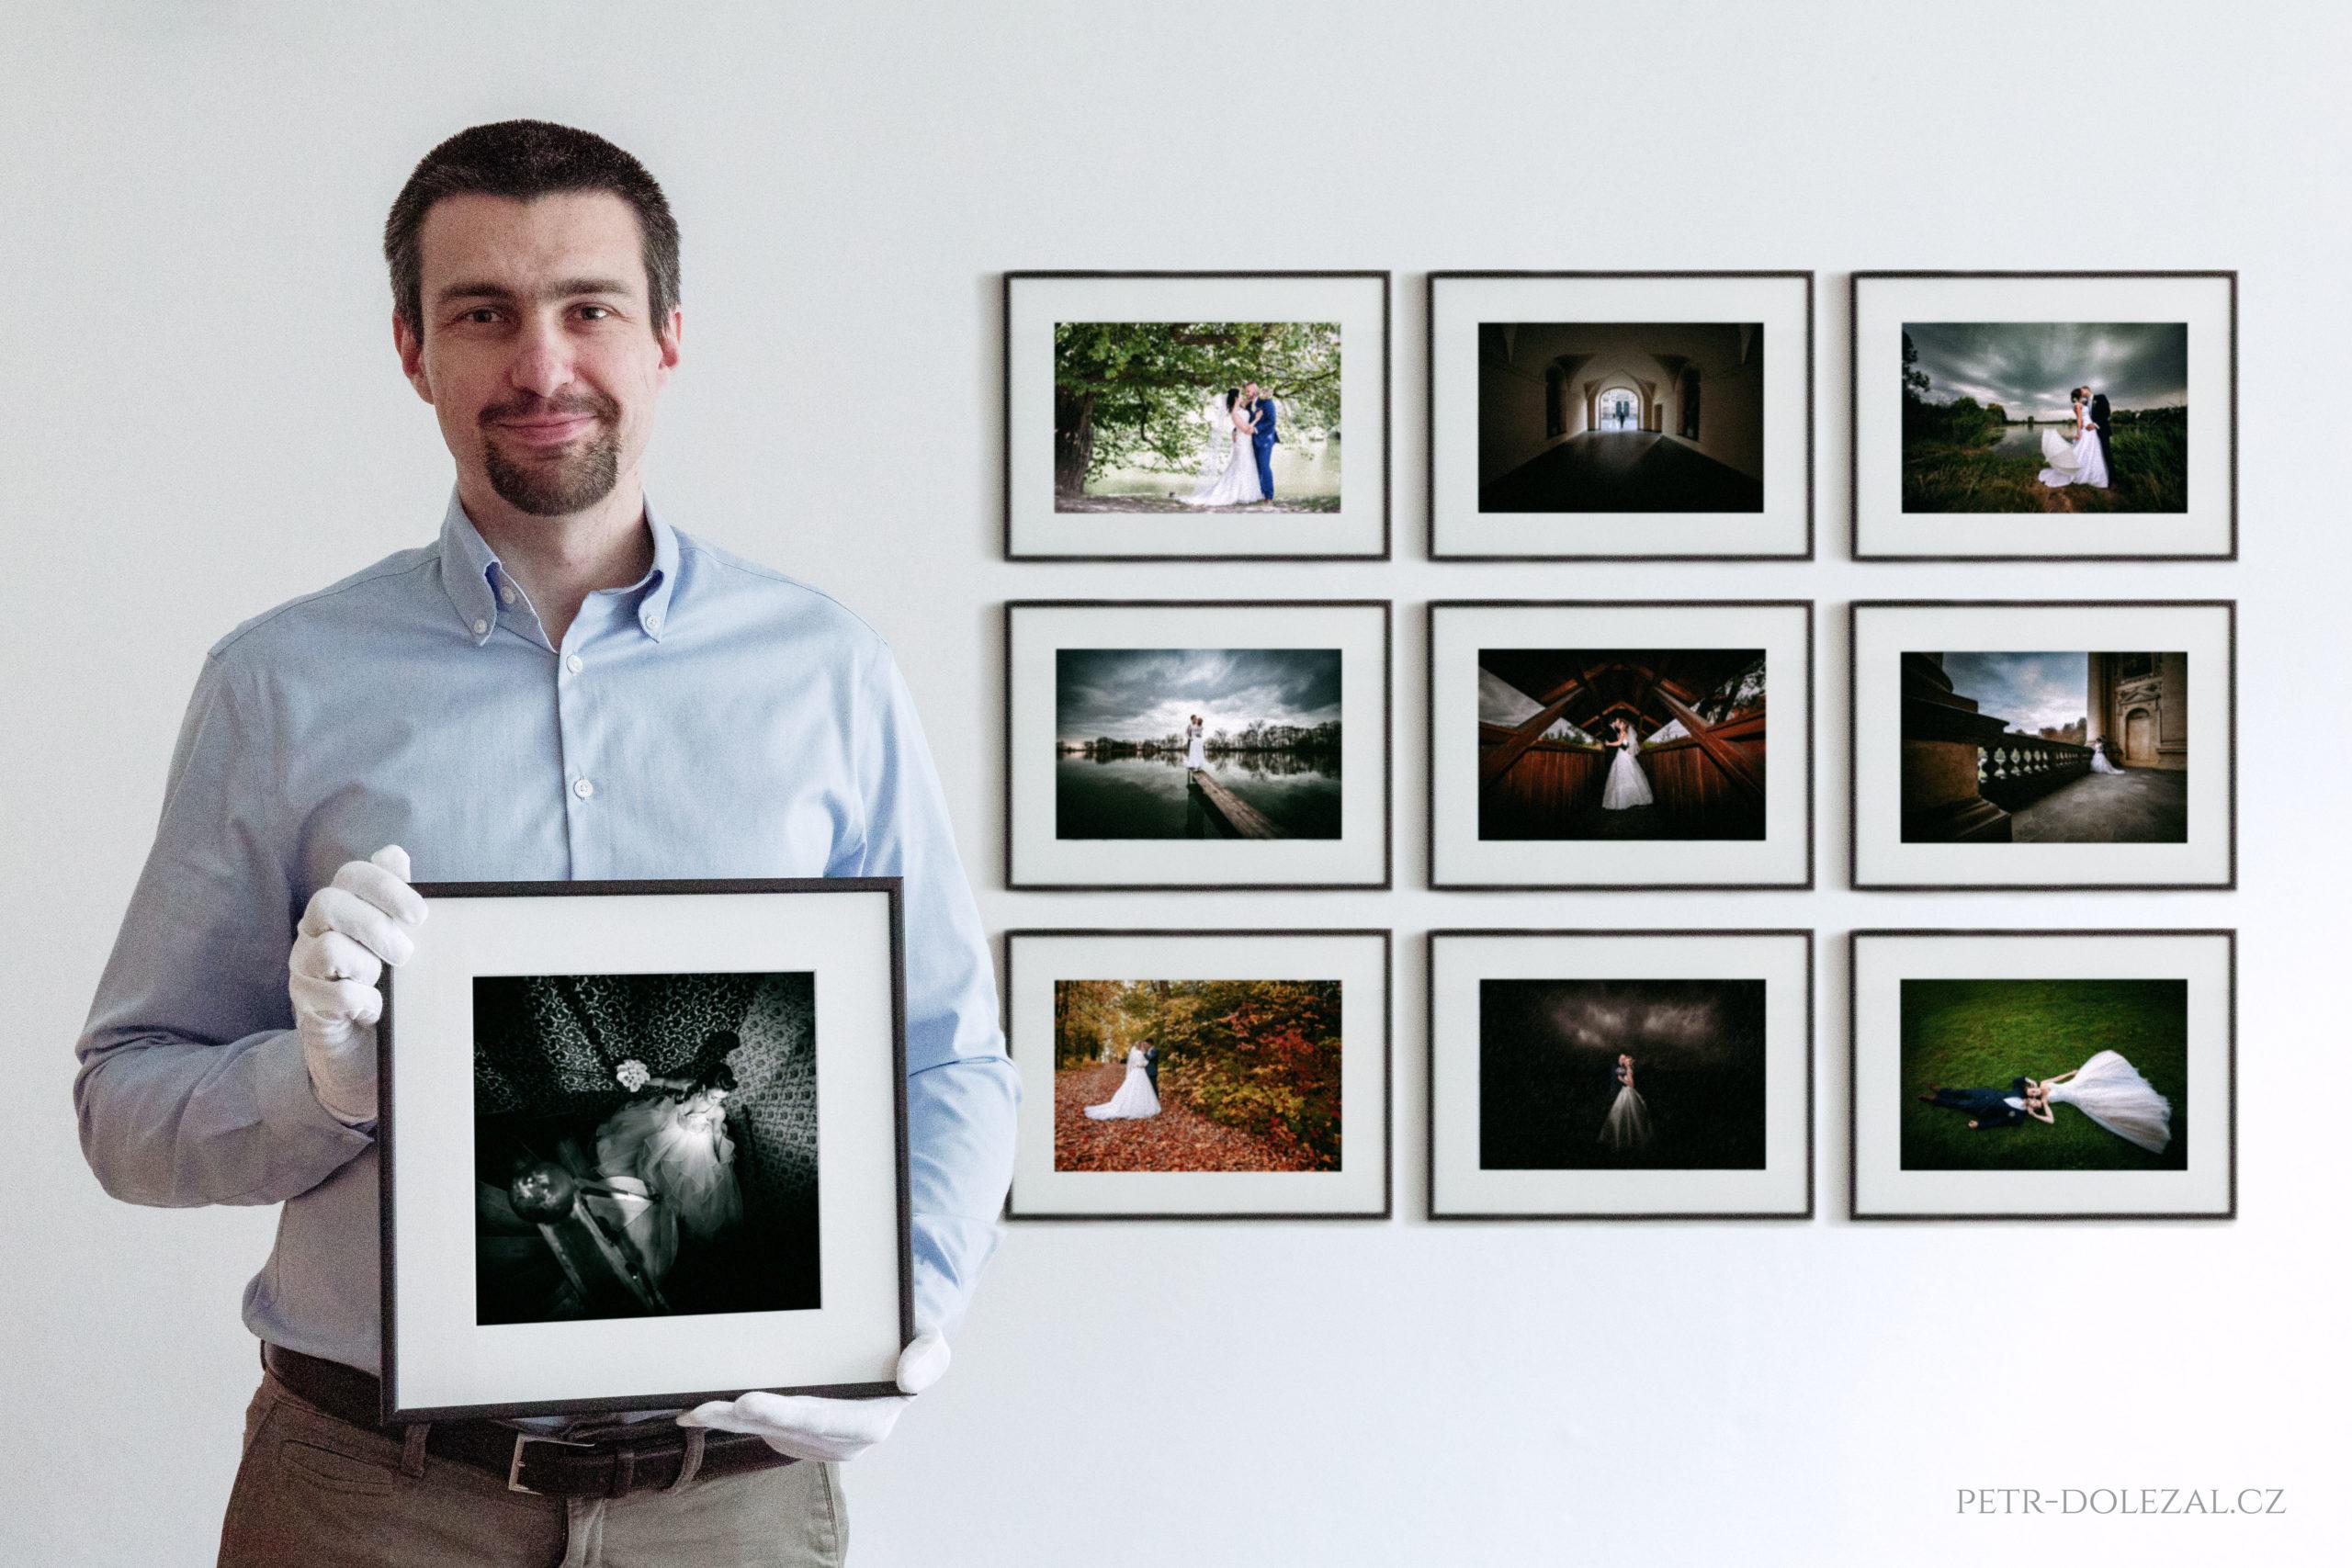 Svatební fotograf Petr Doležal - Praha